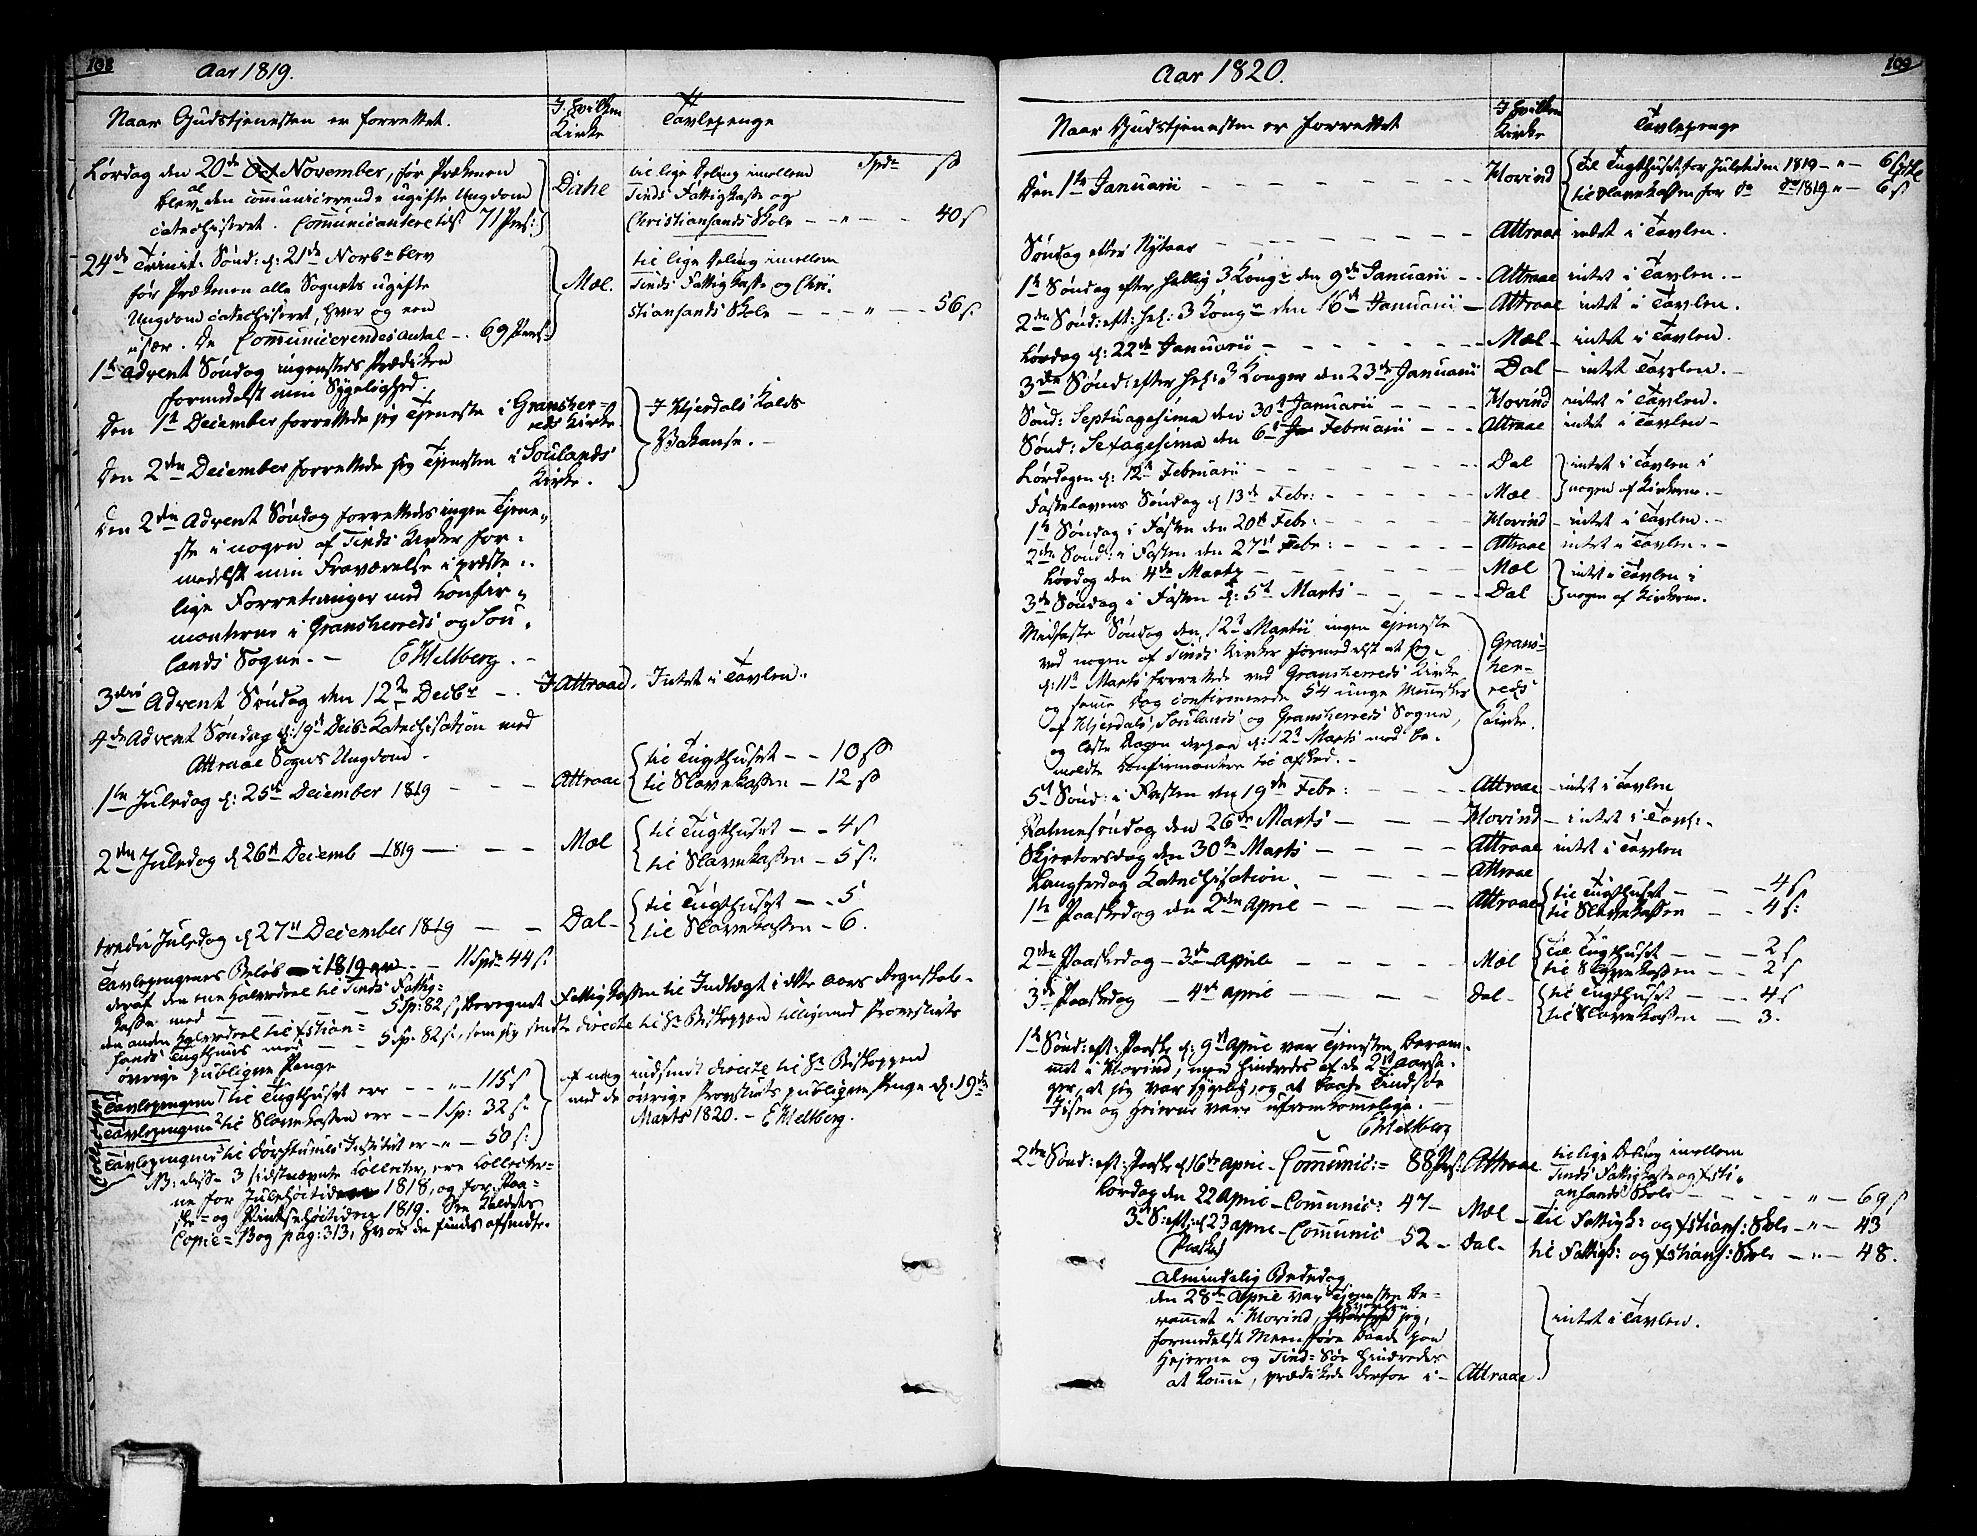 SAKO, Tinn kirkebøker, F/Fa/L0003: Ministerialbok nr. I 3, 1810-1814, s. 108-109